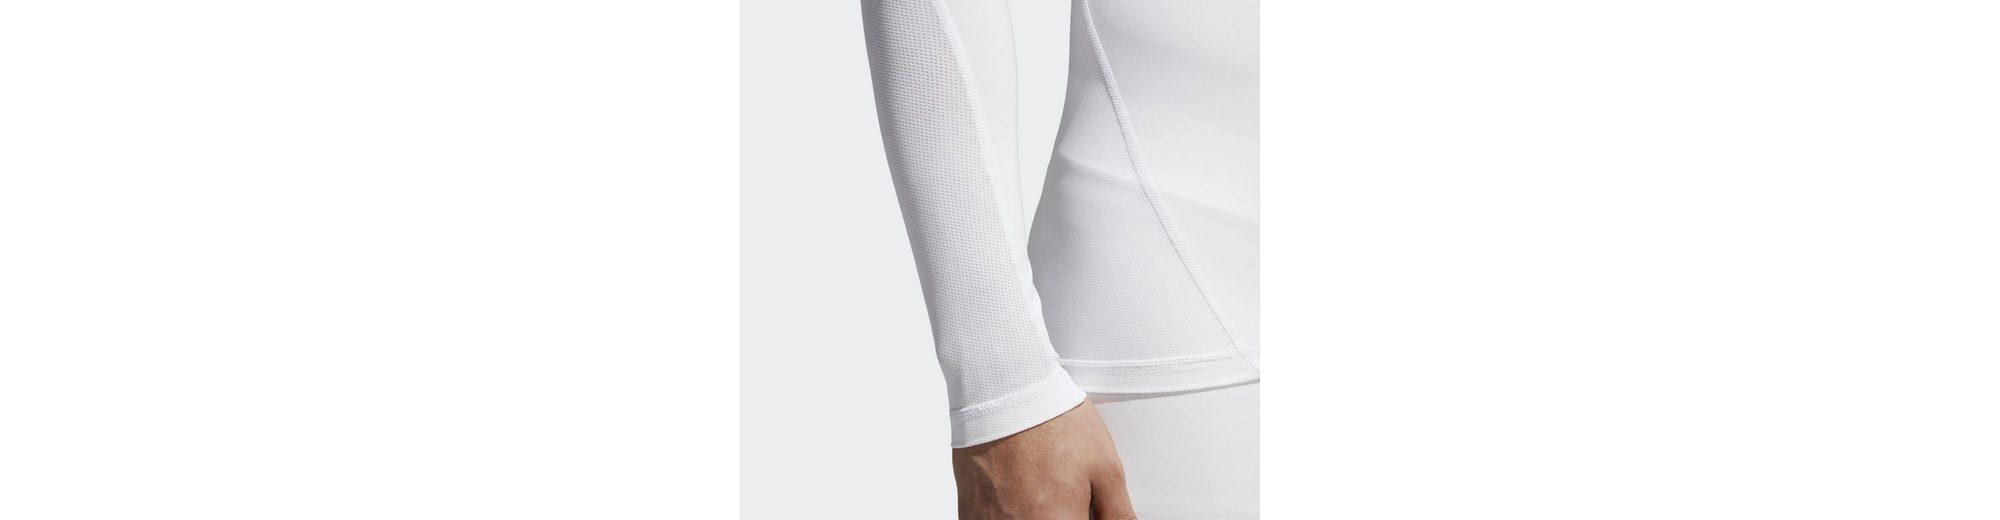 adidas Performance Langarmshirt Alphaskin Sport Online-Shop Fälschen Zum Verkauf Cxl6BZf